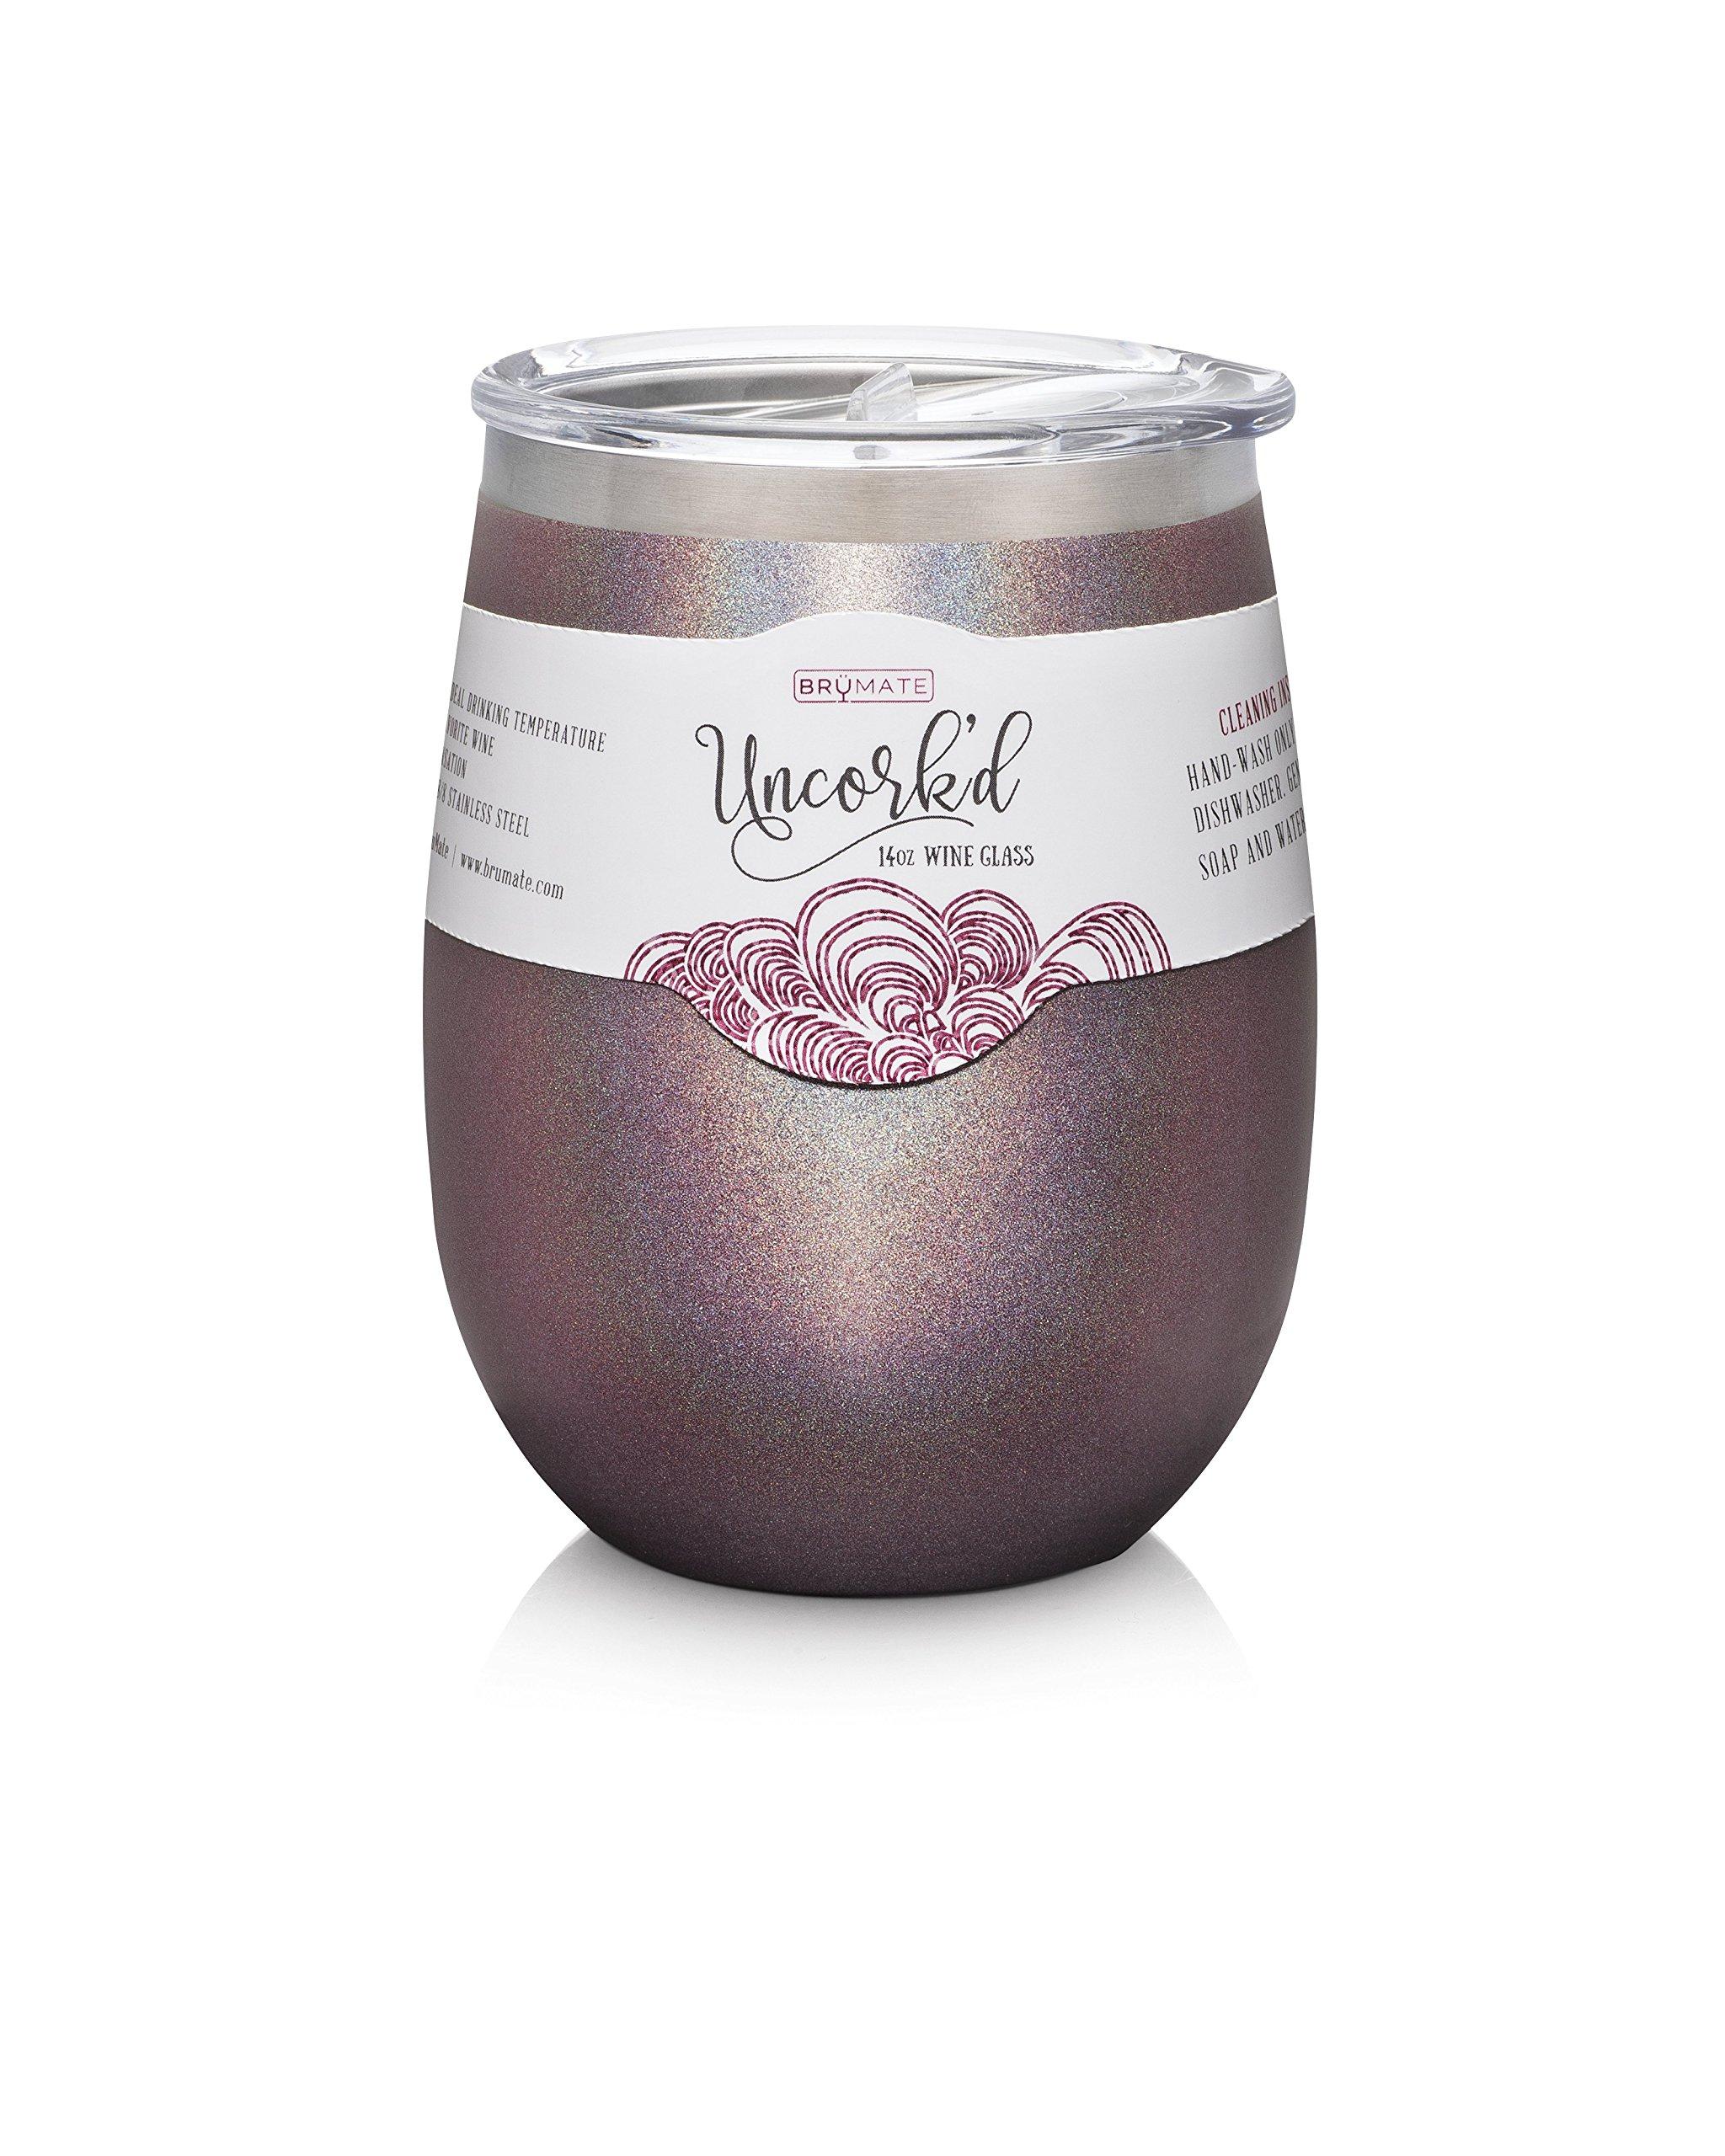 BruMate Uncork'd Insulated Stainless Steel Wine Glass 14oz (Glitter Merlot)